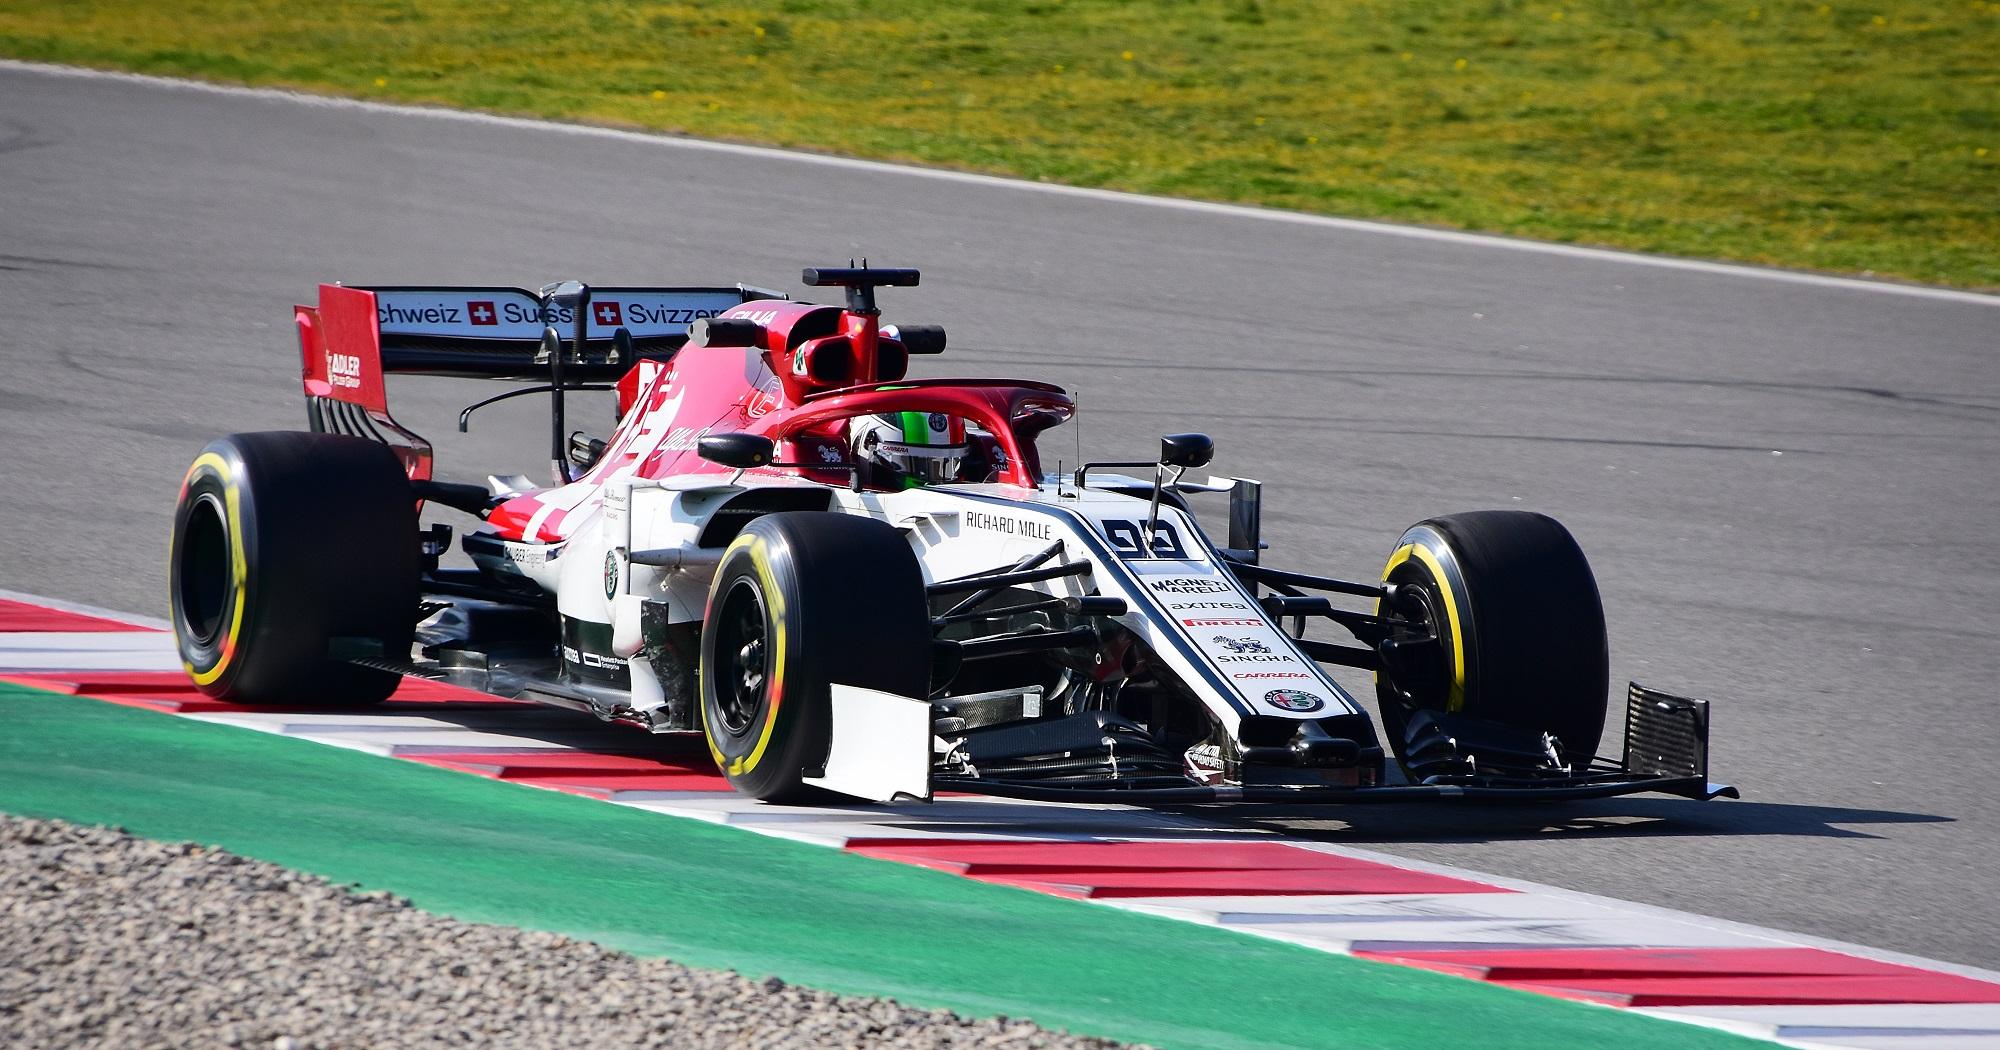 Alfa_Romeo_C38_Antonio_Giovinazzi_ITA_ALFA_ROMEO_RACING_(46388731925).jpg